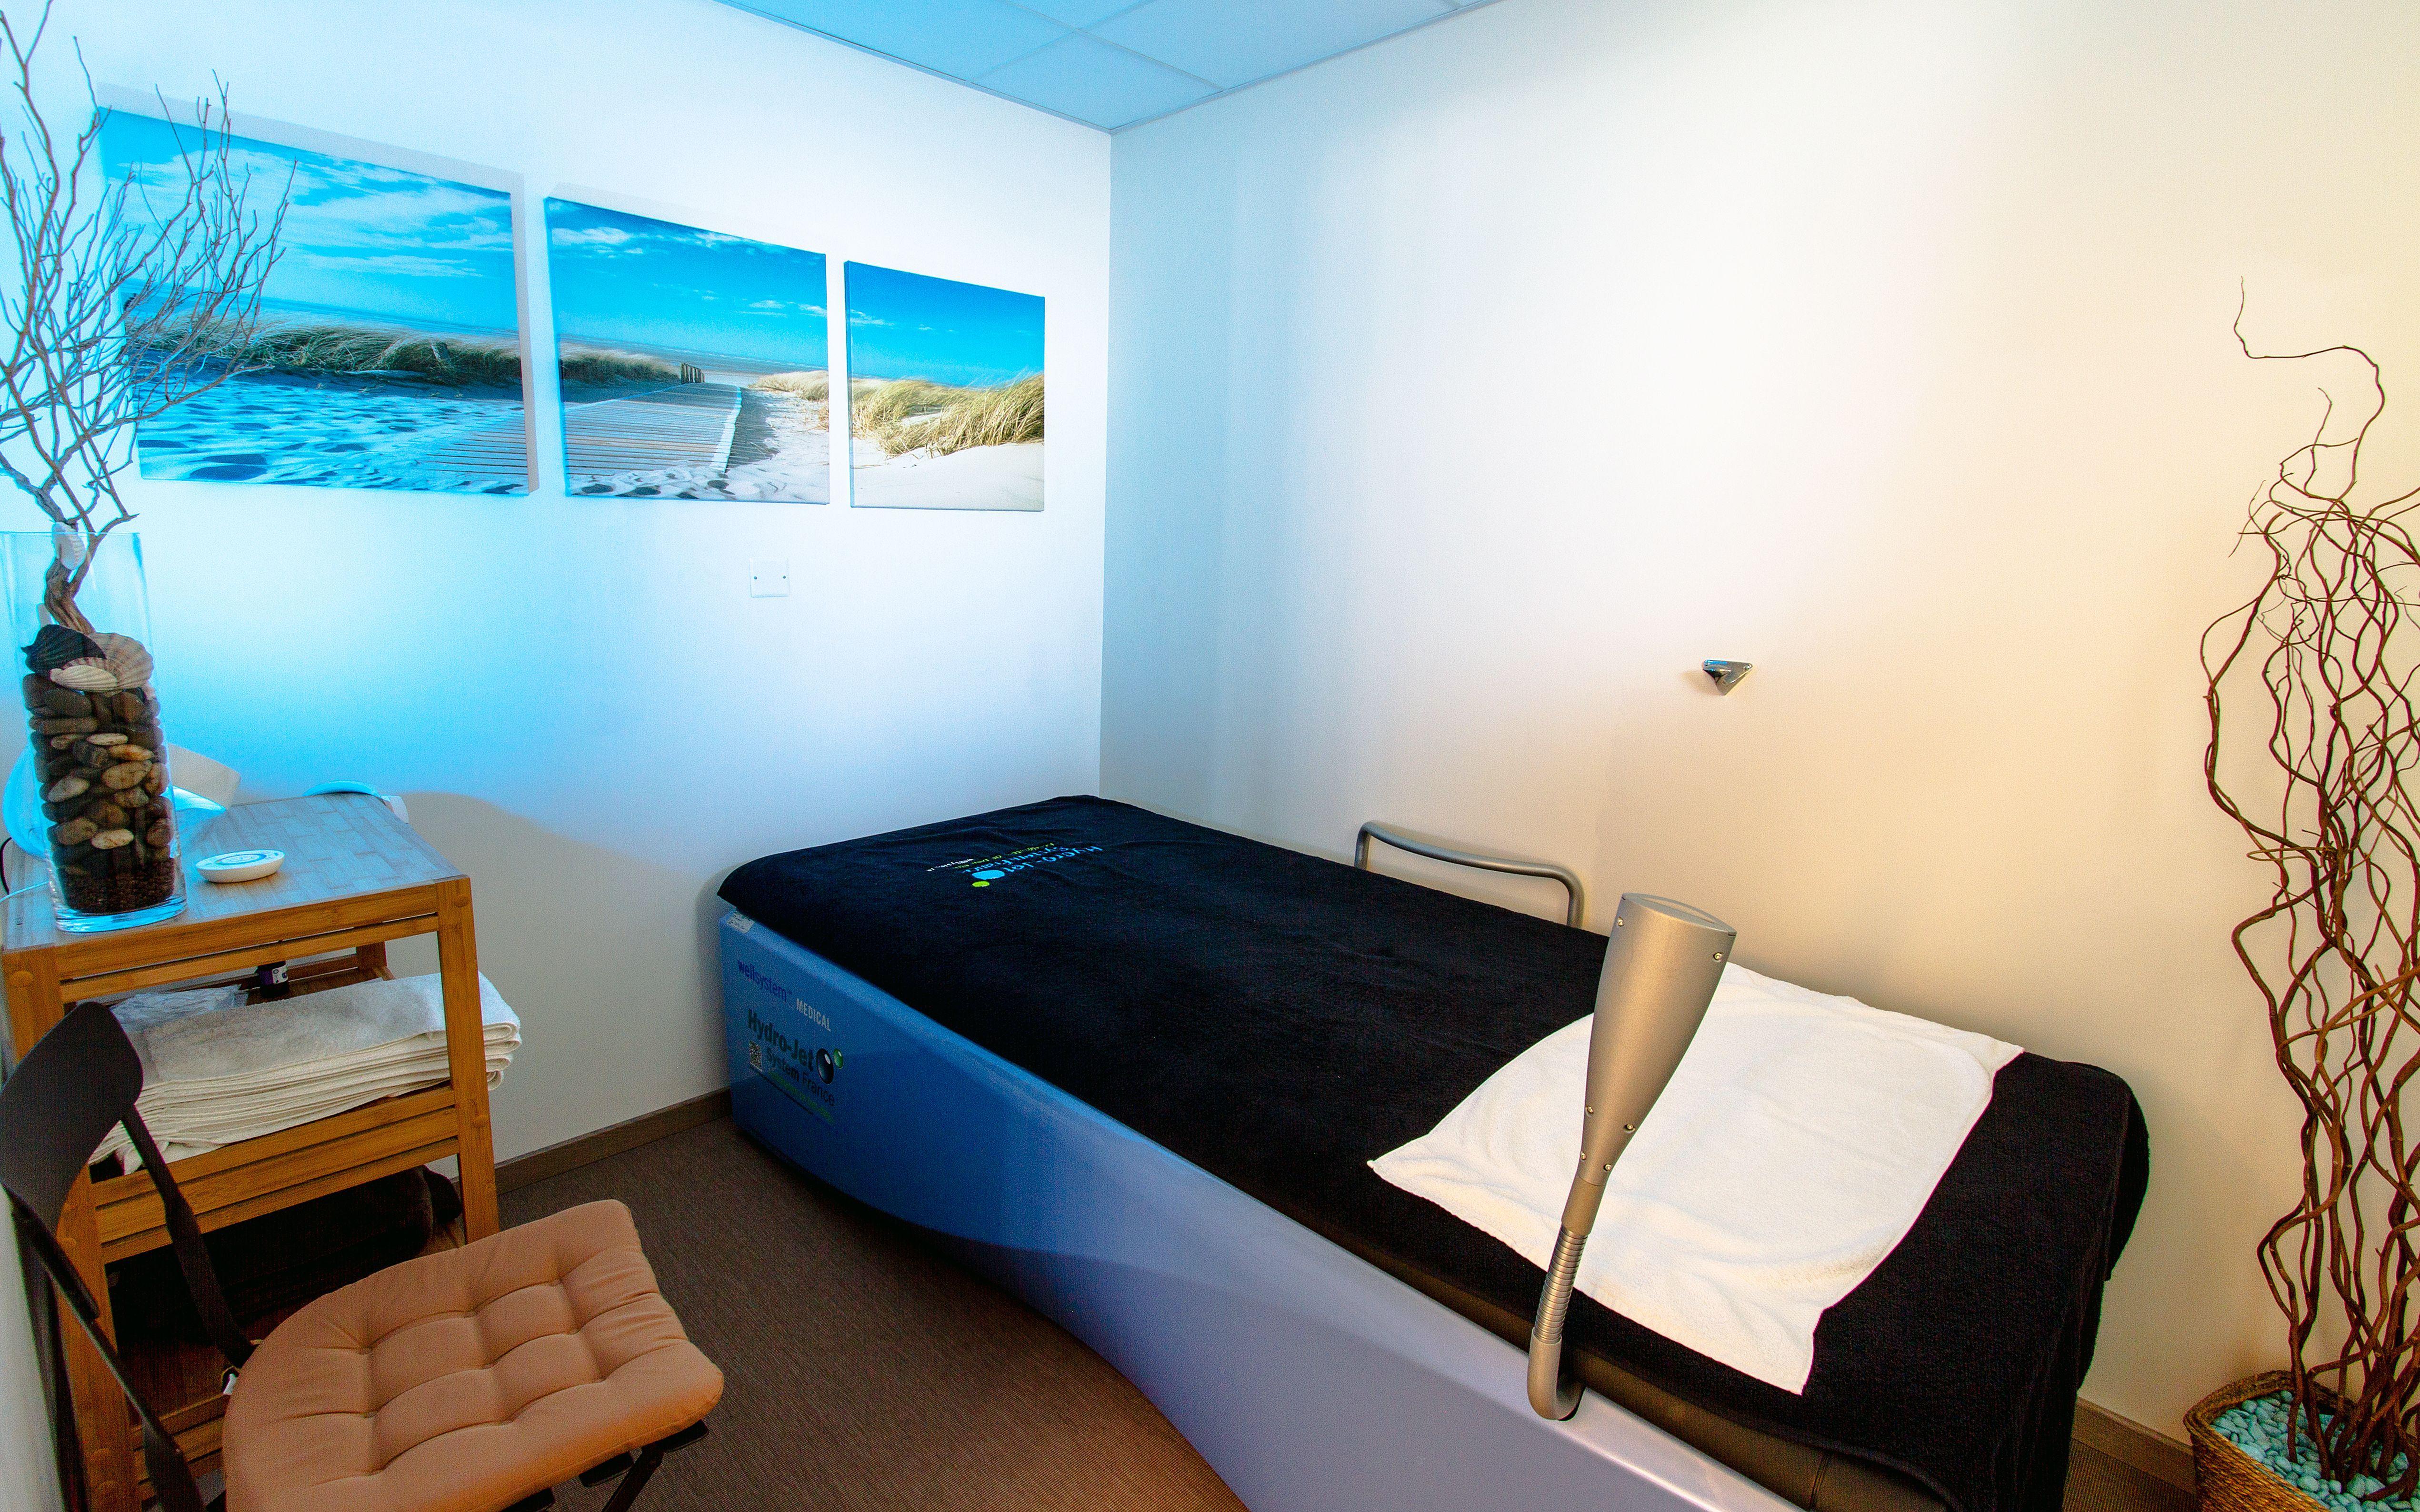 Forme-hotel Montpellier Sud-Est - Parc Expositions - Arena